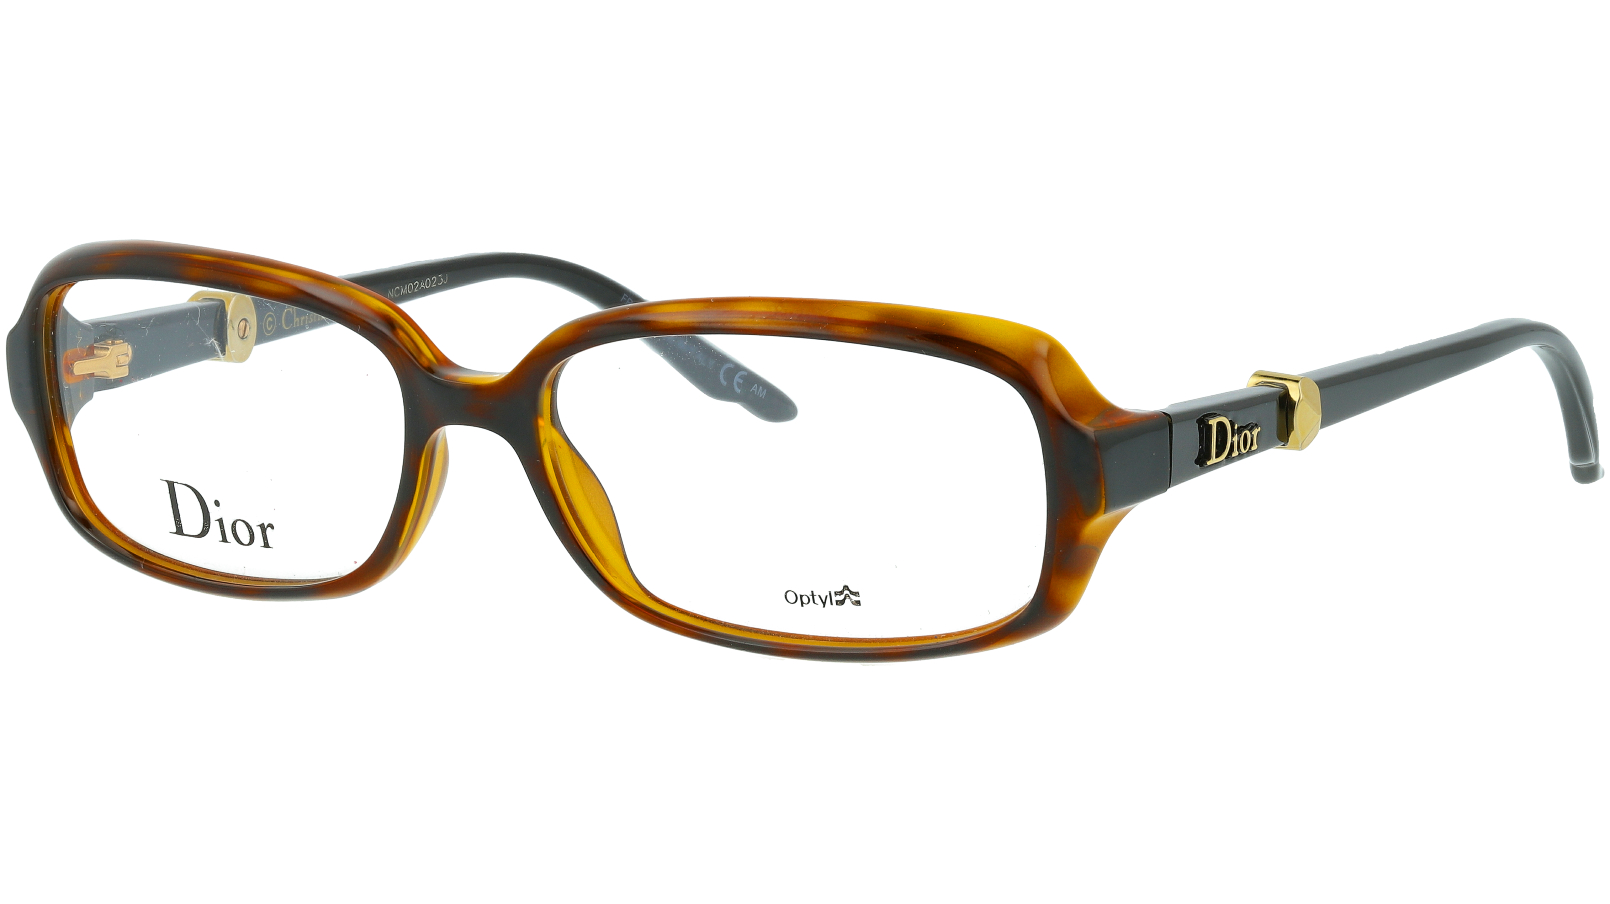 DIOR CD3230 DZZ 53 HAVANA Glasses